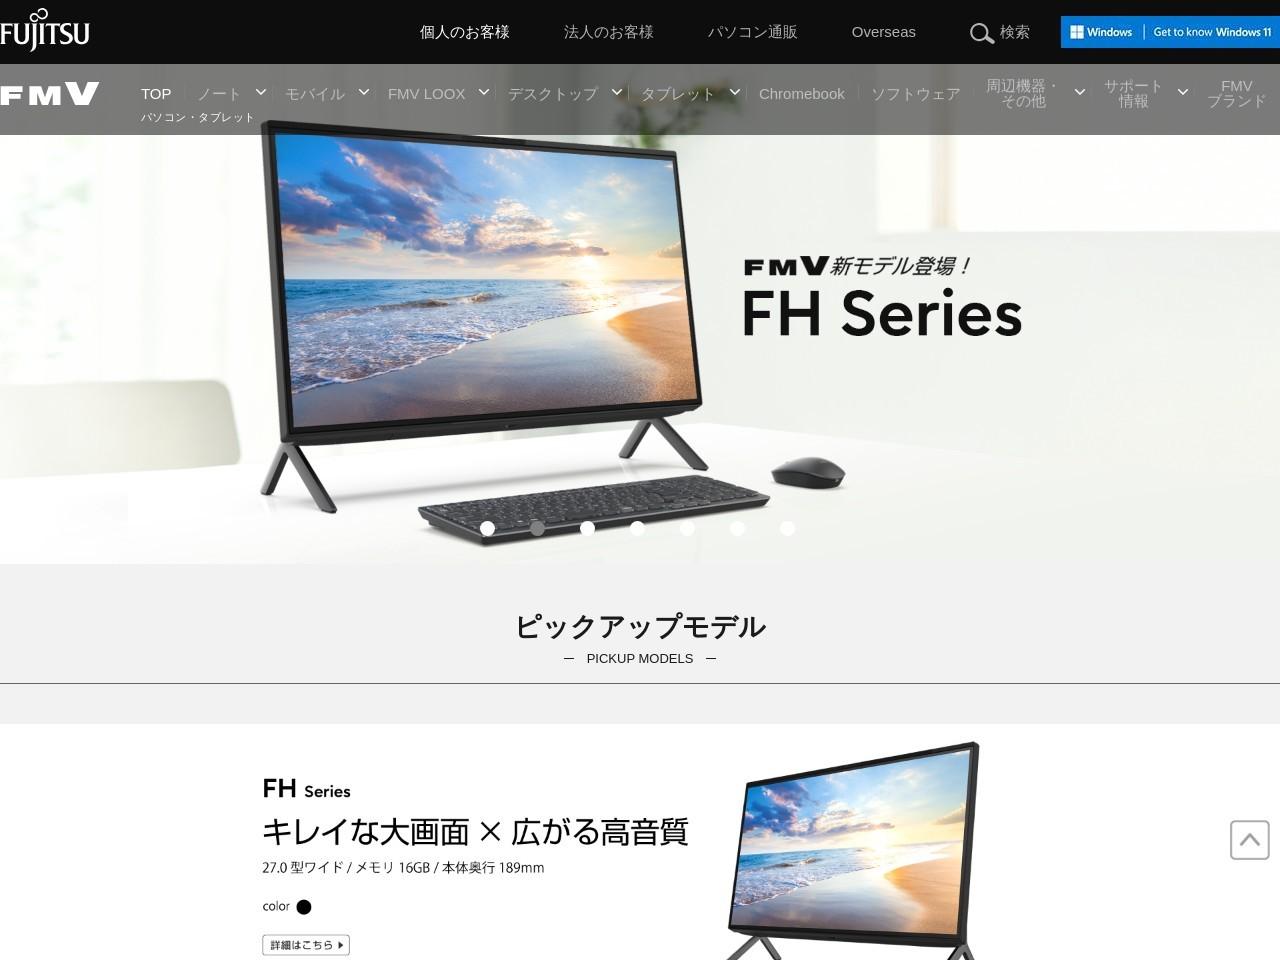 http://www.fmworld.net/fmv/etc/1701/f52b1xg.html